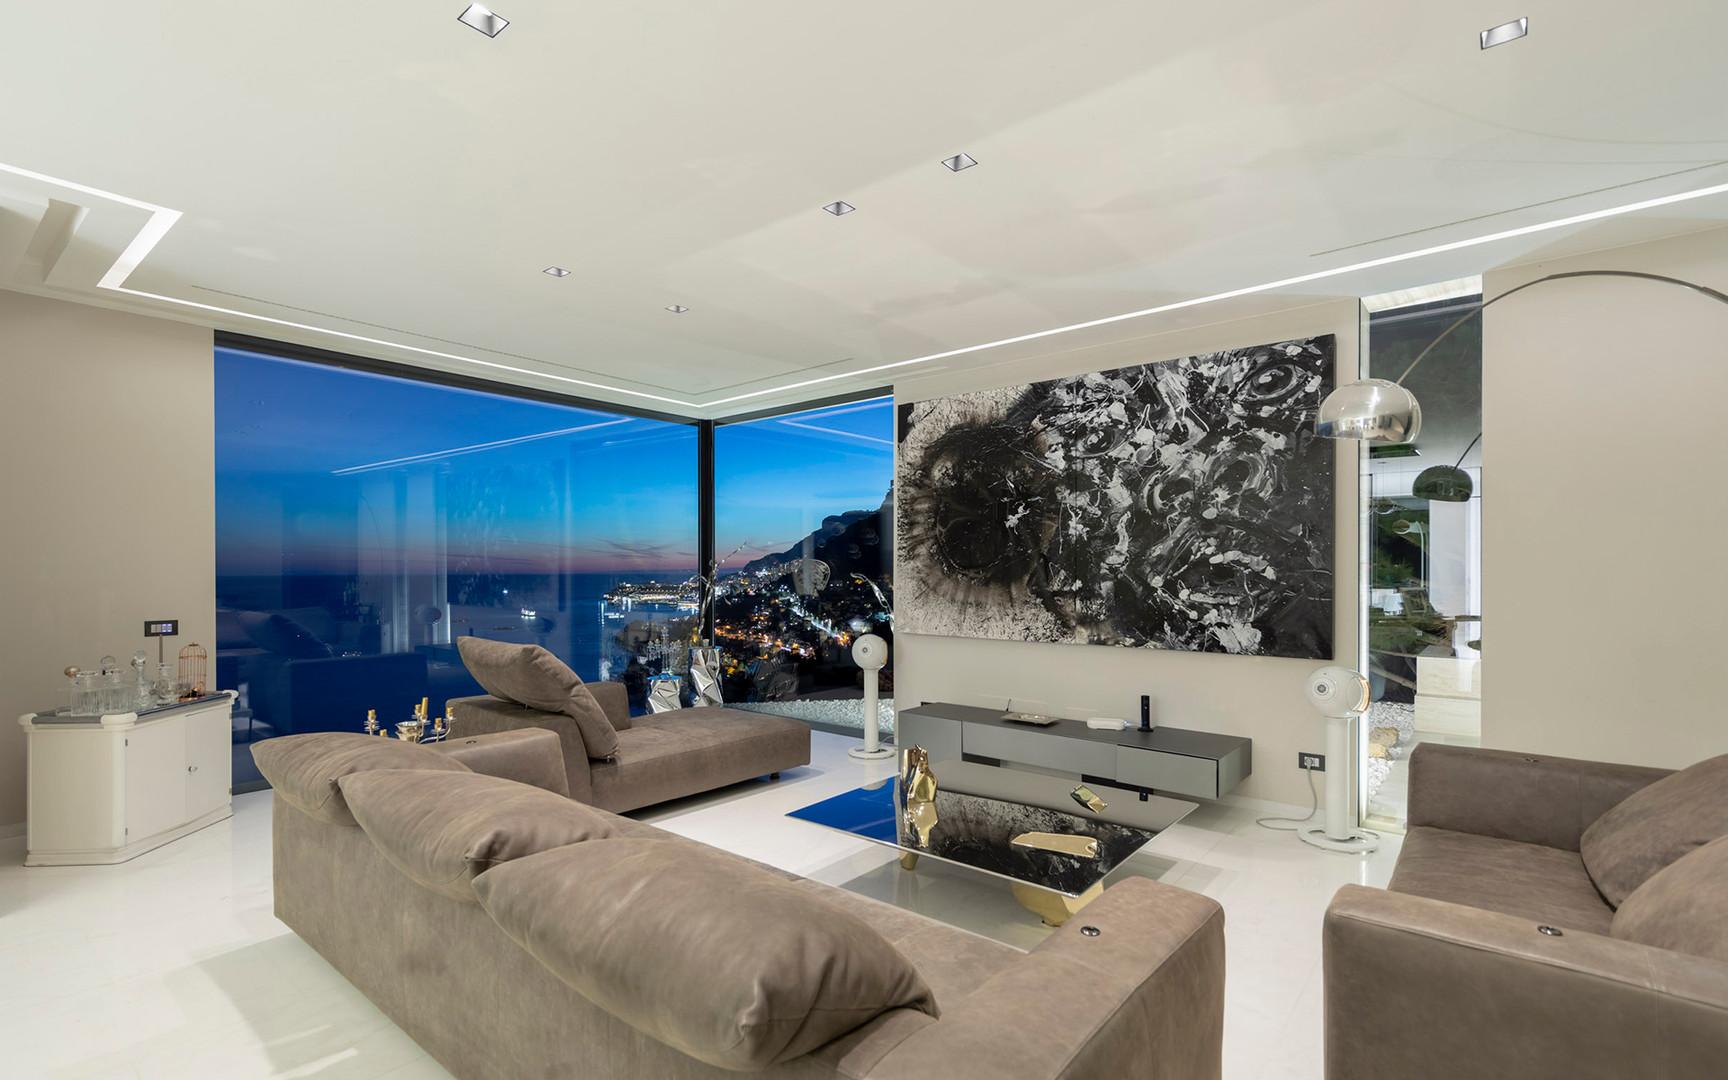 3_indoor_©_Studio_Baraldi_BO-1076.jpg